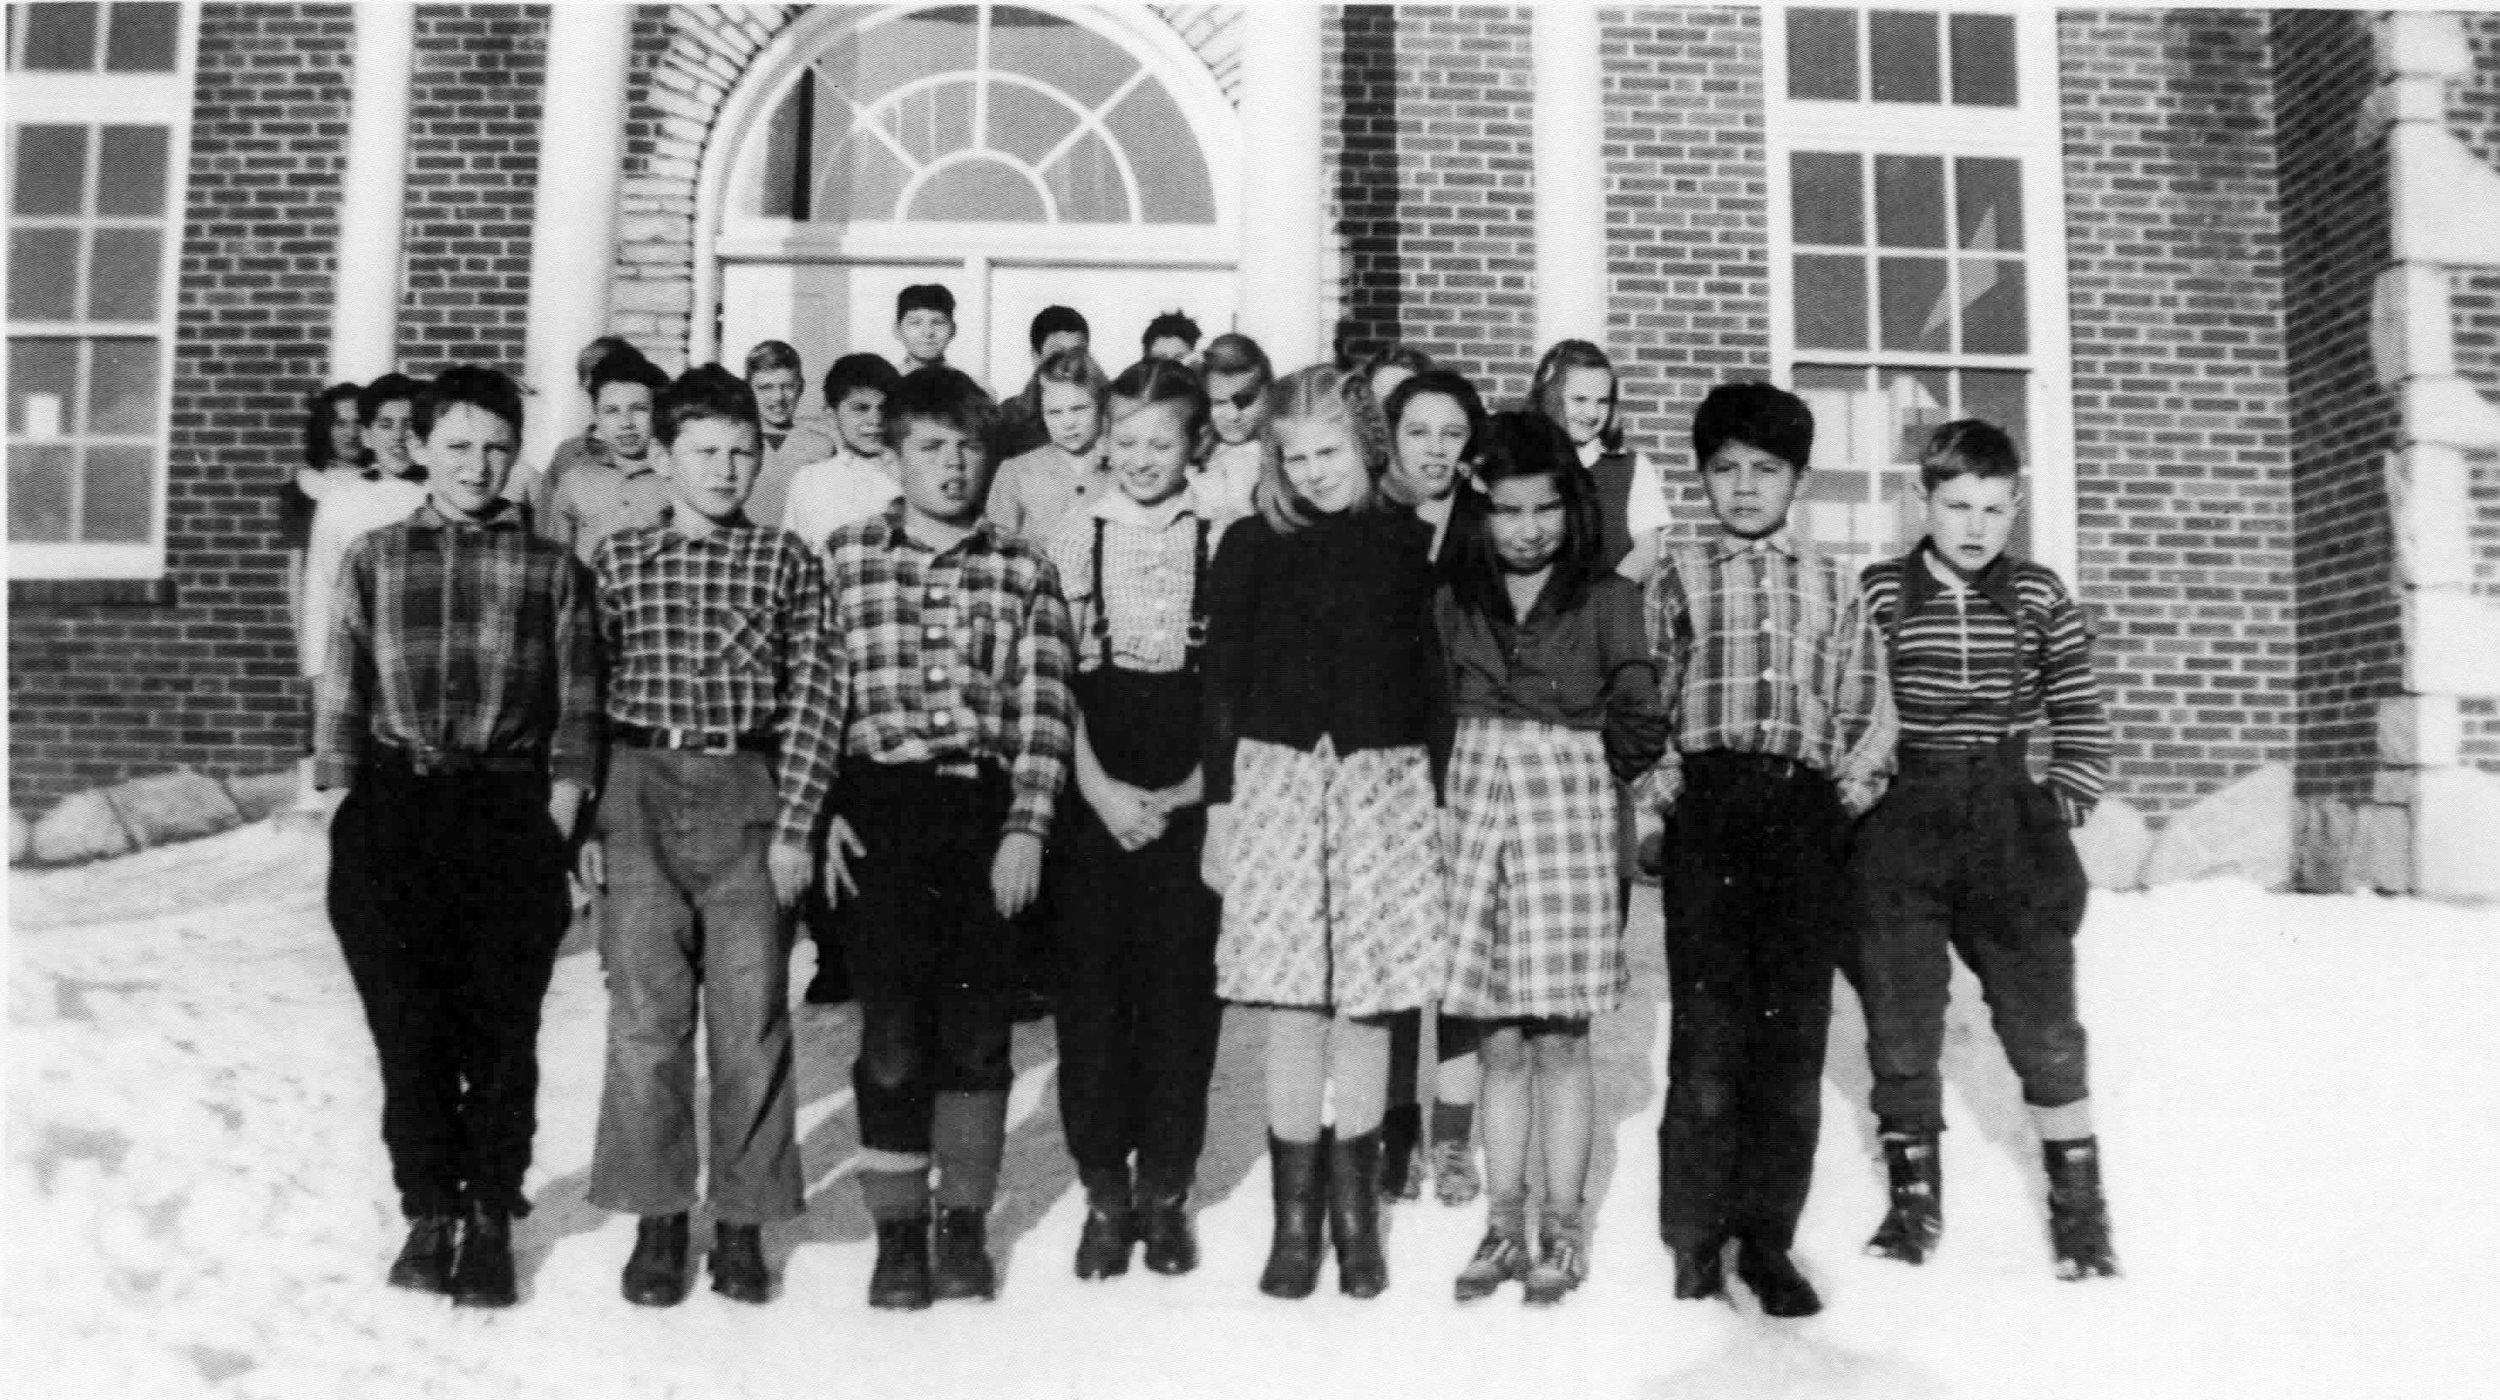 1939-1940 Class Photo - Front Row L-RGene Harrison, Tom McLeod, Bob Nye, Margaret McDonald, Cleo Pope, Shirley Andrews, Joe Andrews, _____?Back Rows L-R_____?, _____?, _____?, _____?, Jim Johnson, Jim Andrews, Wilfred Causley, Dorothy Huffman, _____?, _____?, Ireta Lindberg, _____?, _____?, Martina Mertaugh